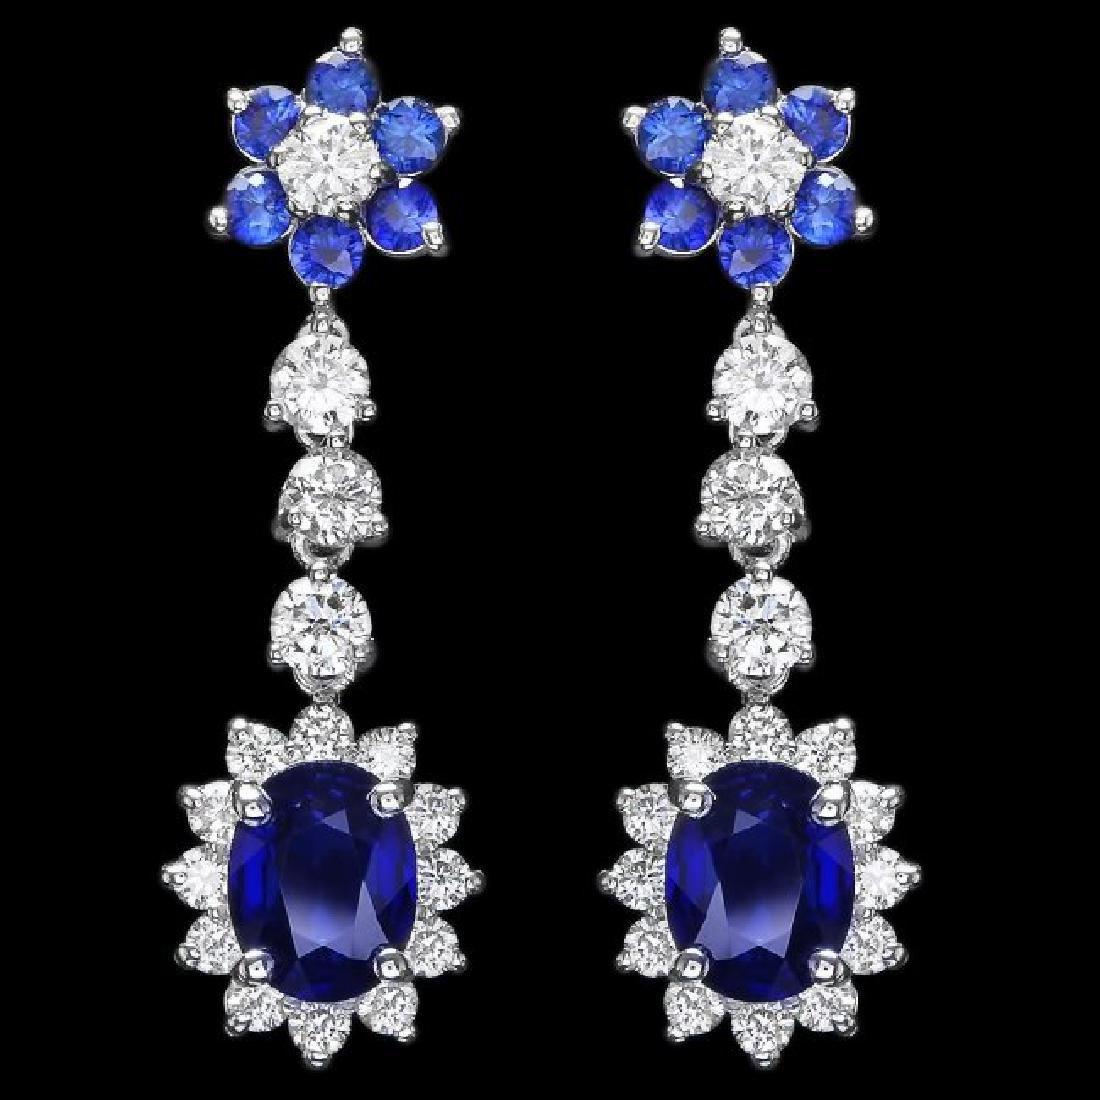 14k Gold 3.15ct Sapphire 2.00ct Diamond Earrings